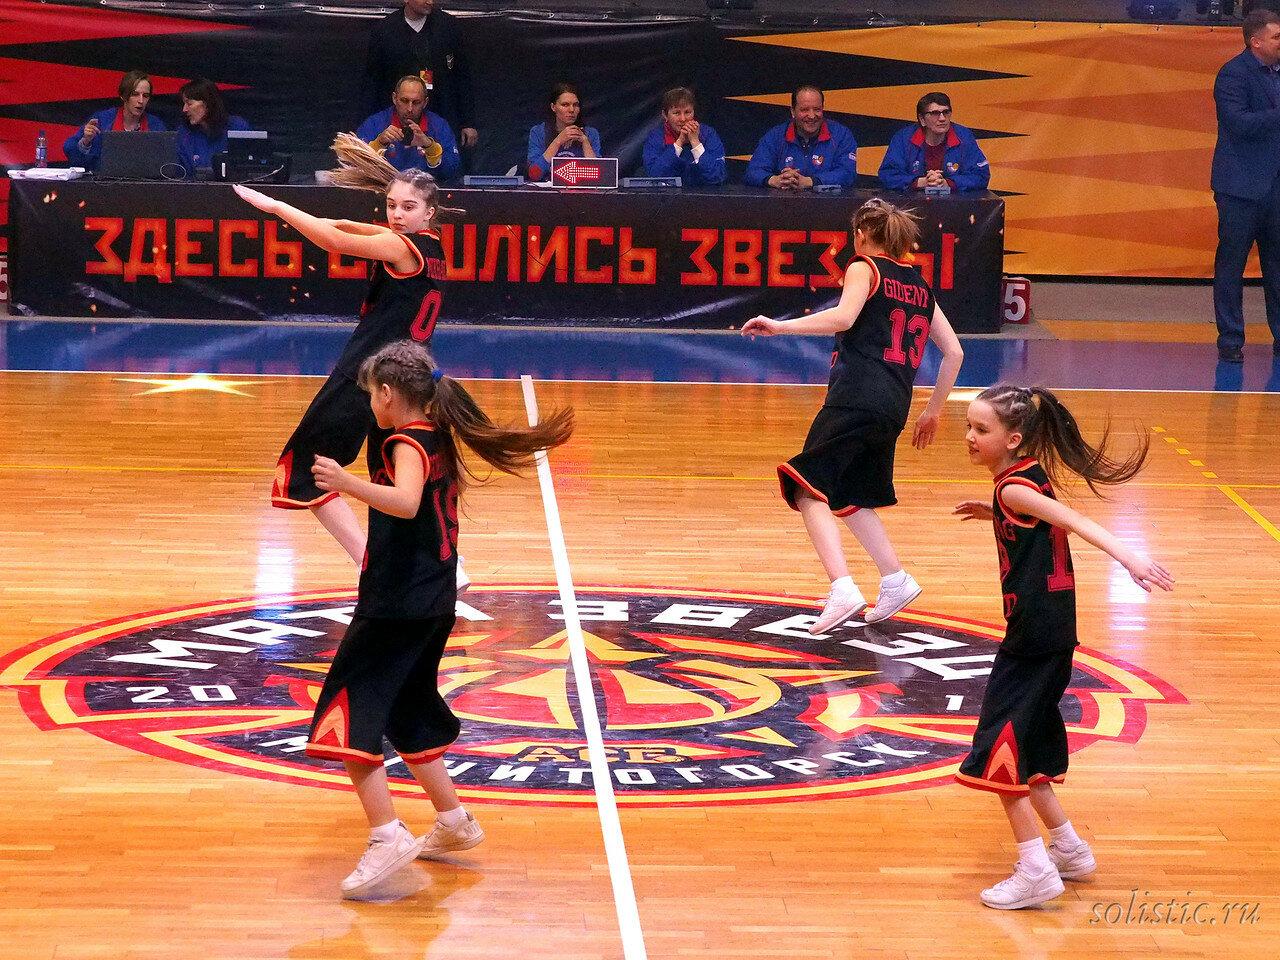 132 Матч звезд АСБ 2018 (ассоциации студенческого баскетбола)